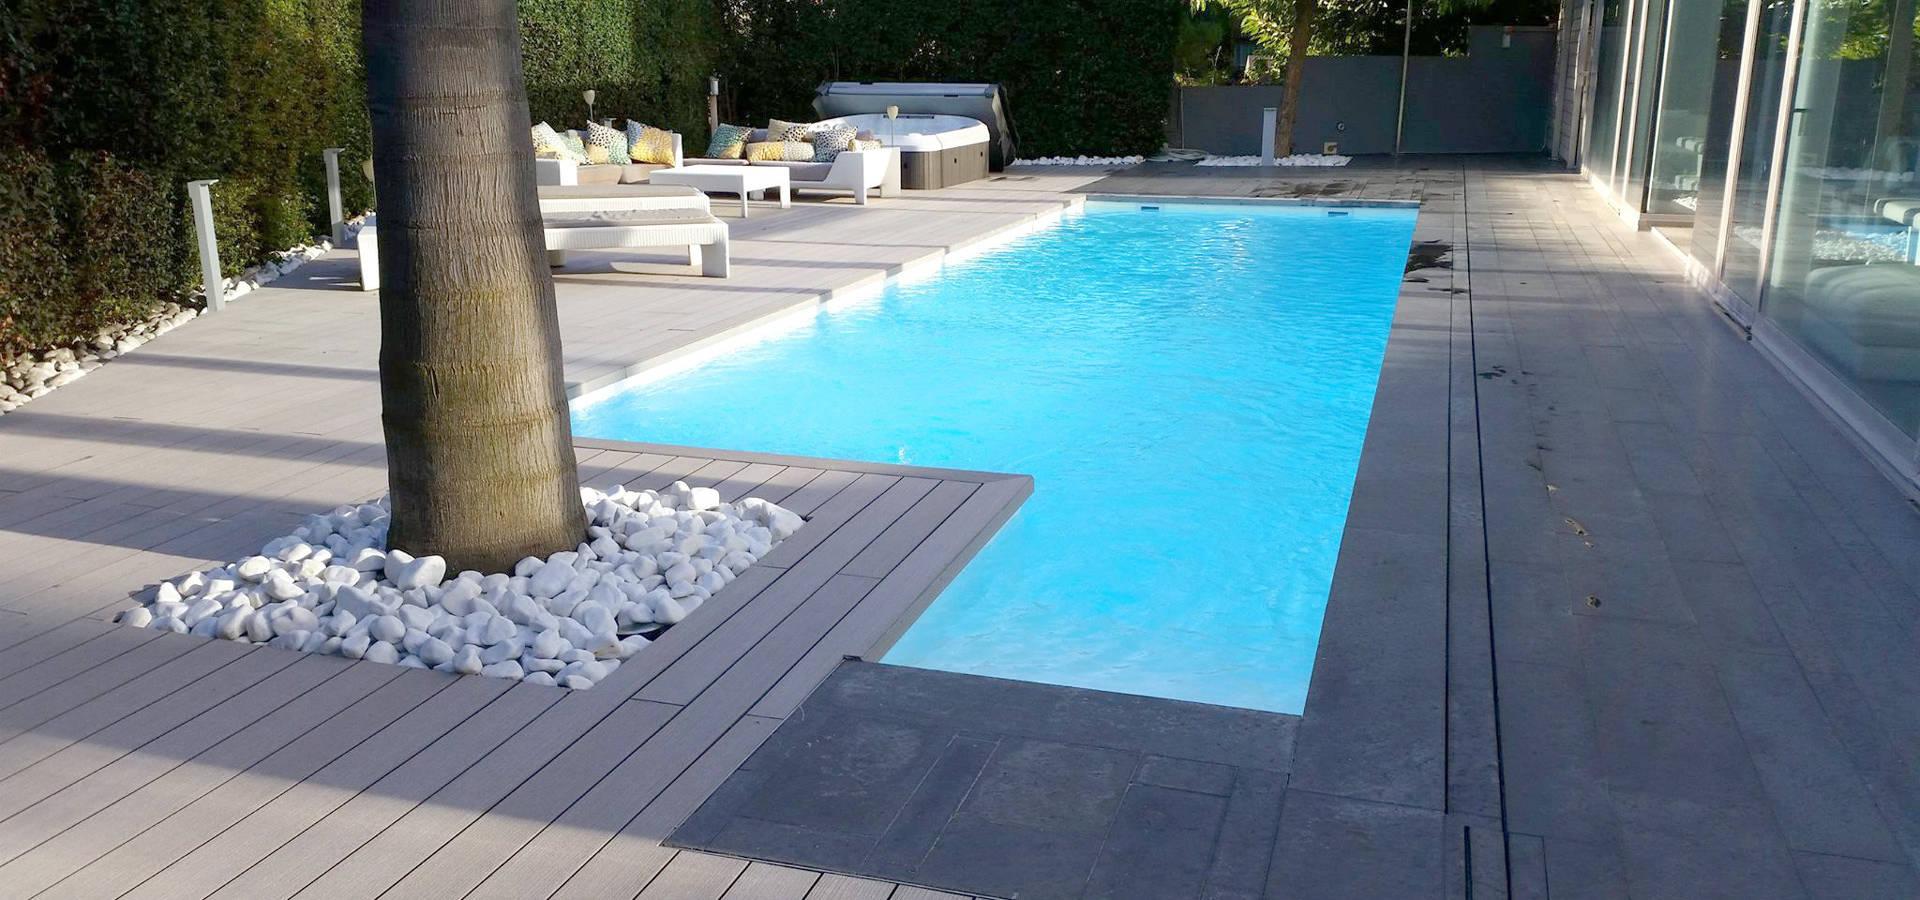 Piscina color gris oscuro renolit alkorplan2000 de renolit - Gresite piscinas colores ...